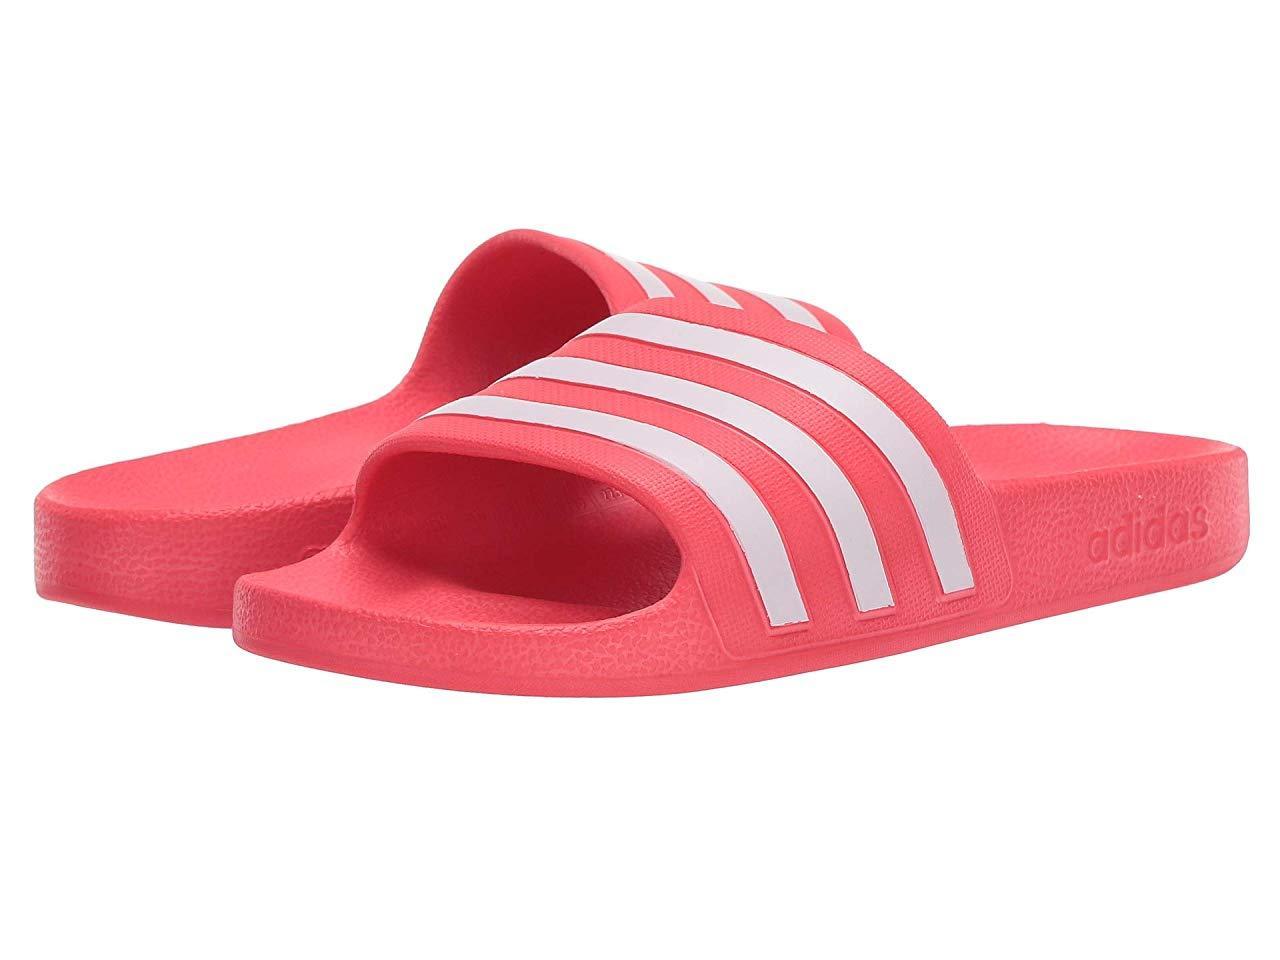 Сандали/Вьетнамки adidas Adilette Aqua Shock Red/Footwear White/Shock Red